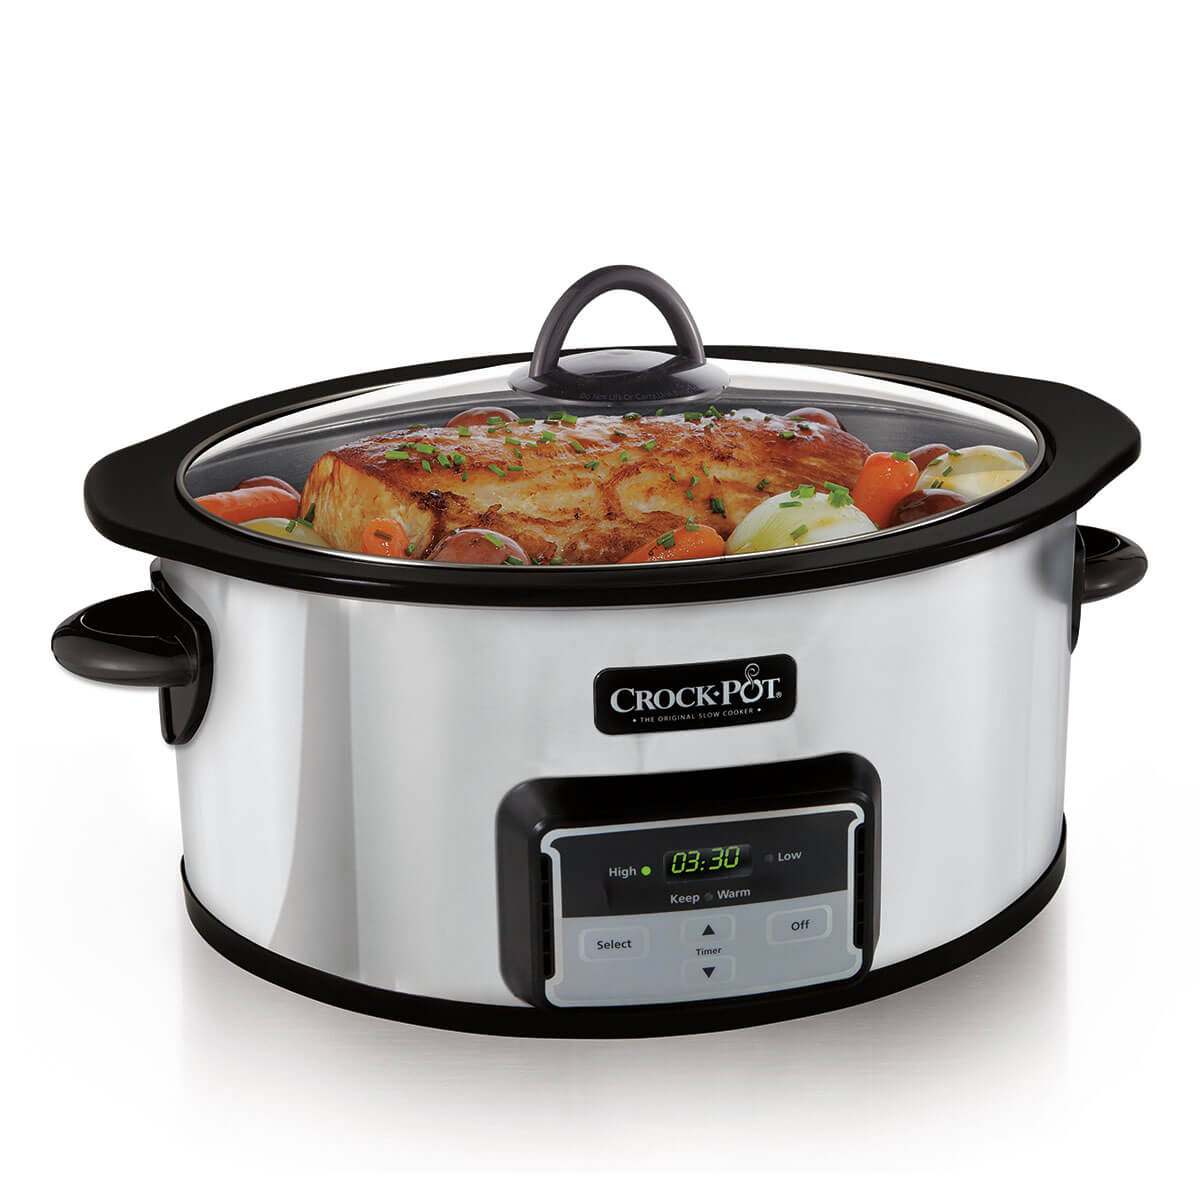 My 10 Favorite Small Kitchen Appliances: 6-Quart Crock Pot | gimmesomeoven.com